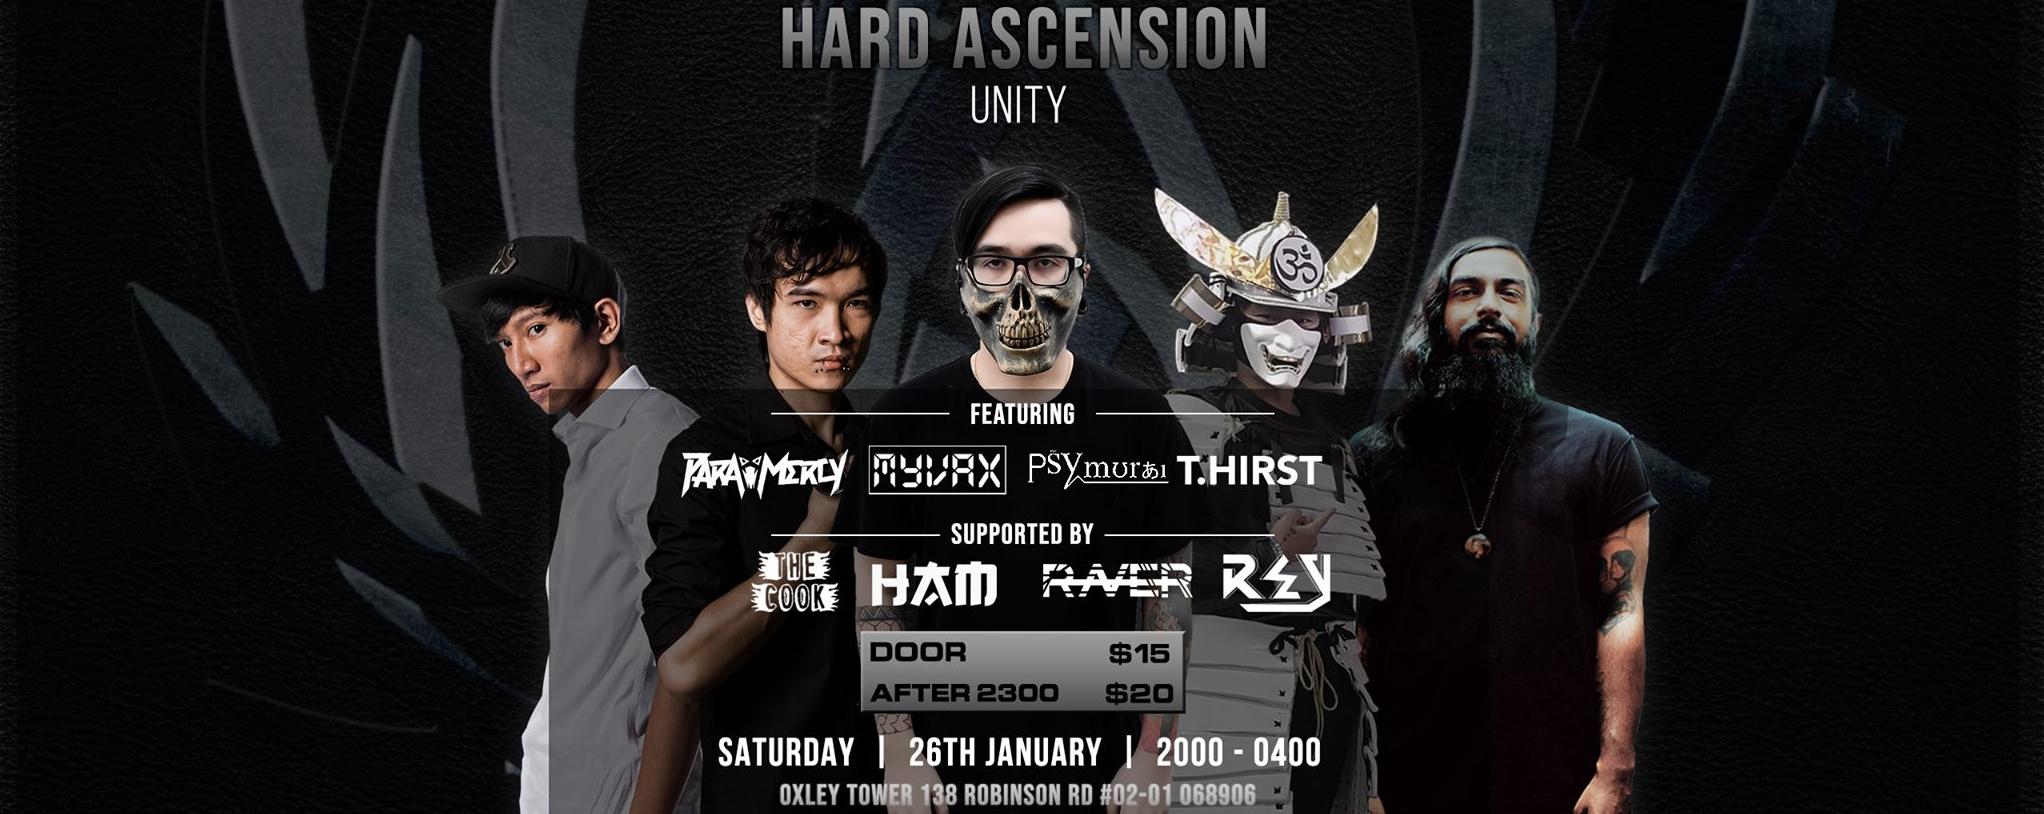 Hard Ascension Live - Unity